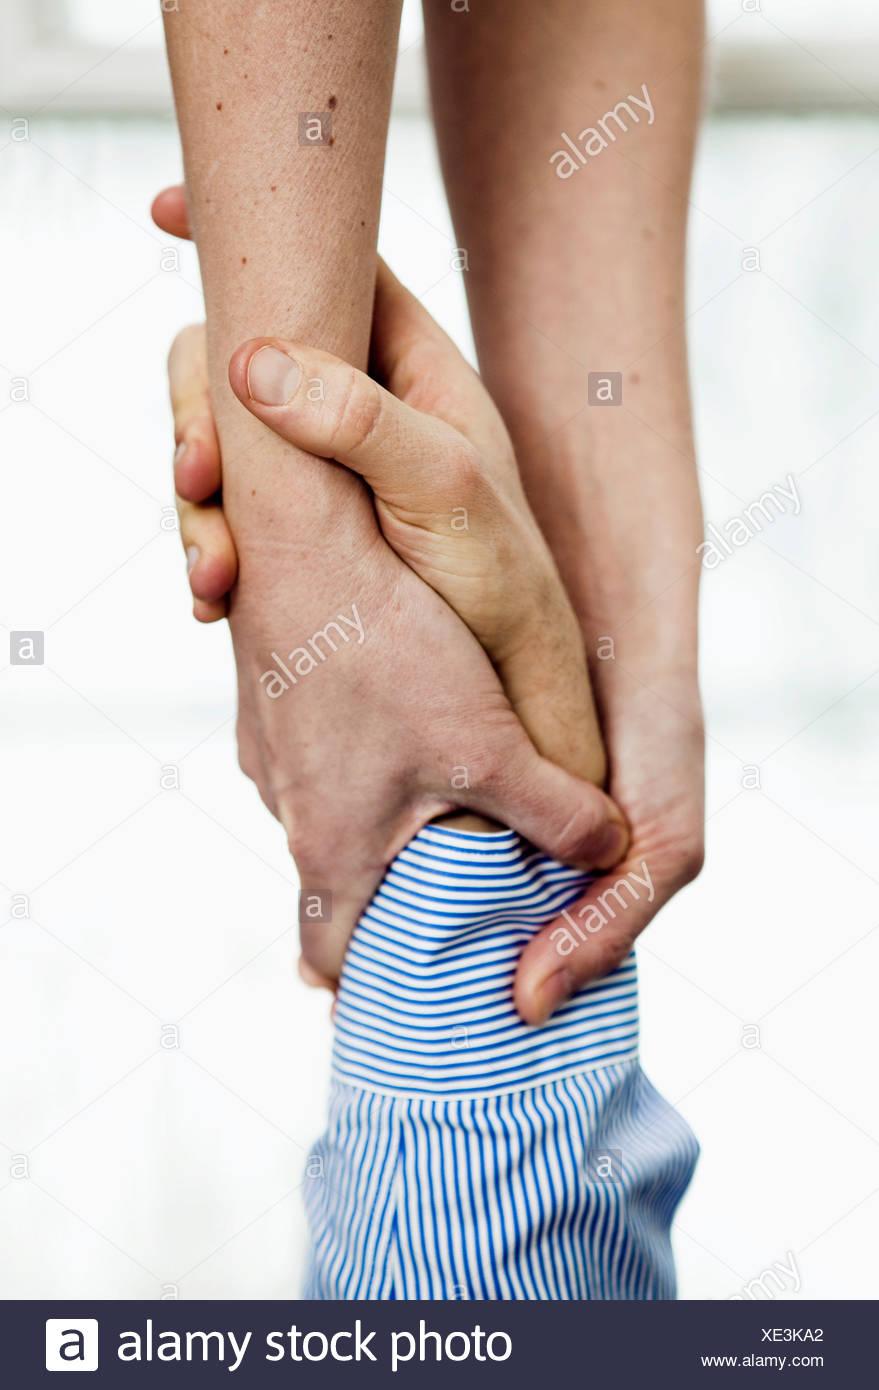 Woman grasping man's wrist, close-up - Stock Image